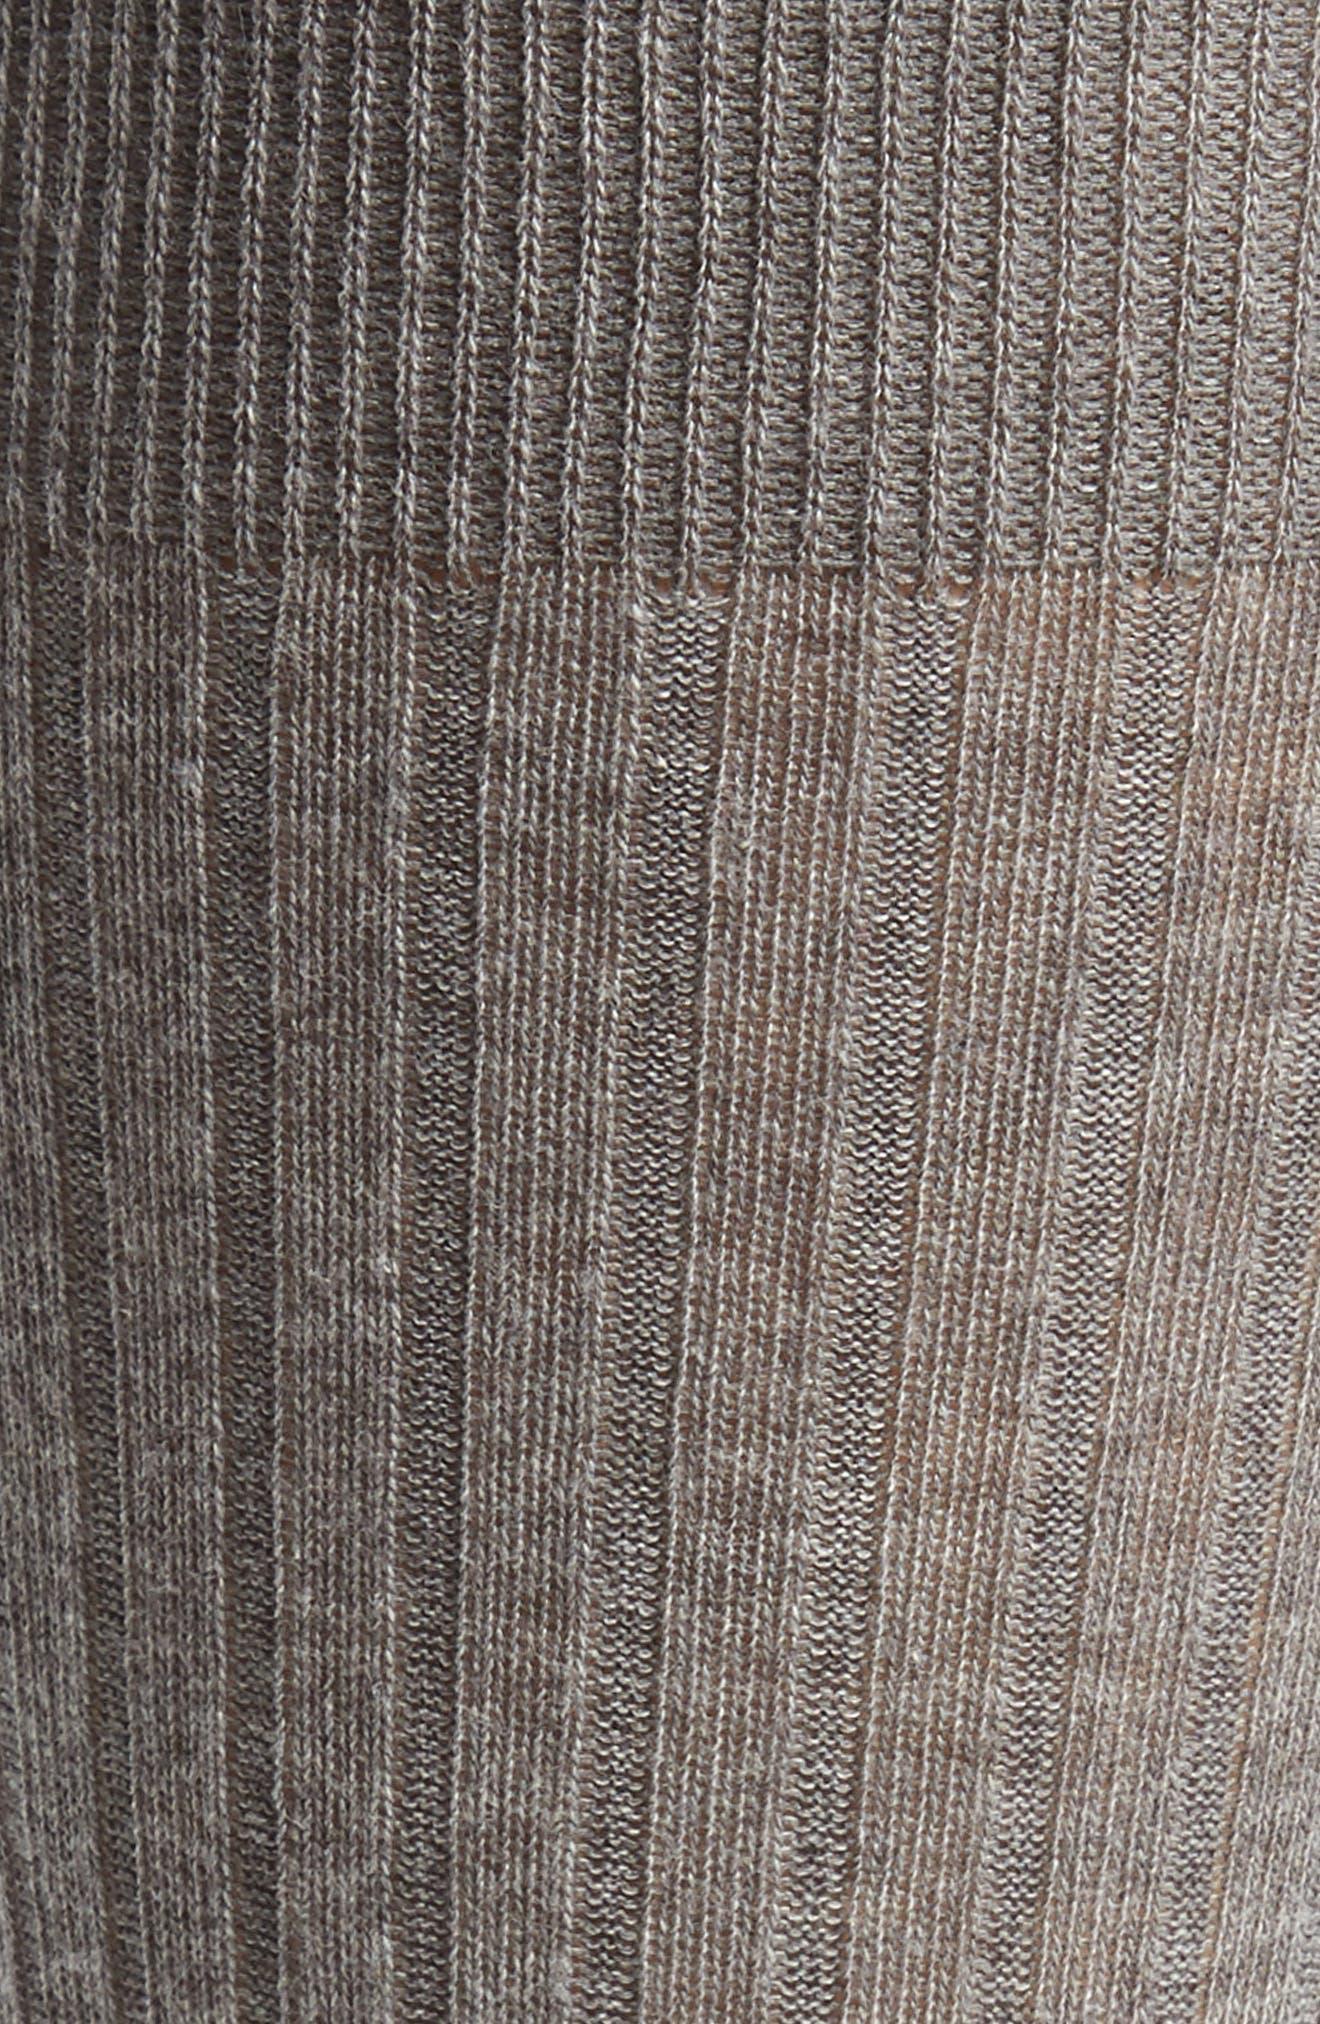 Ribbed Pima Cotton Crew Socks,                             Alternate thumbnail 2, color,                             GREY HEATHER